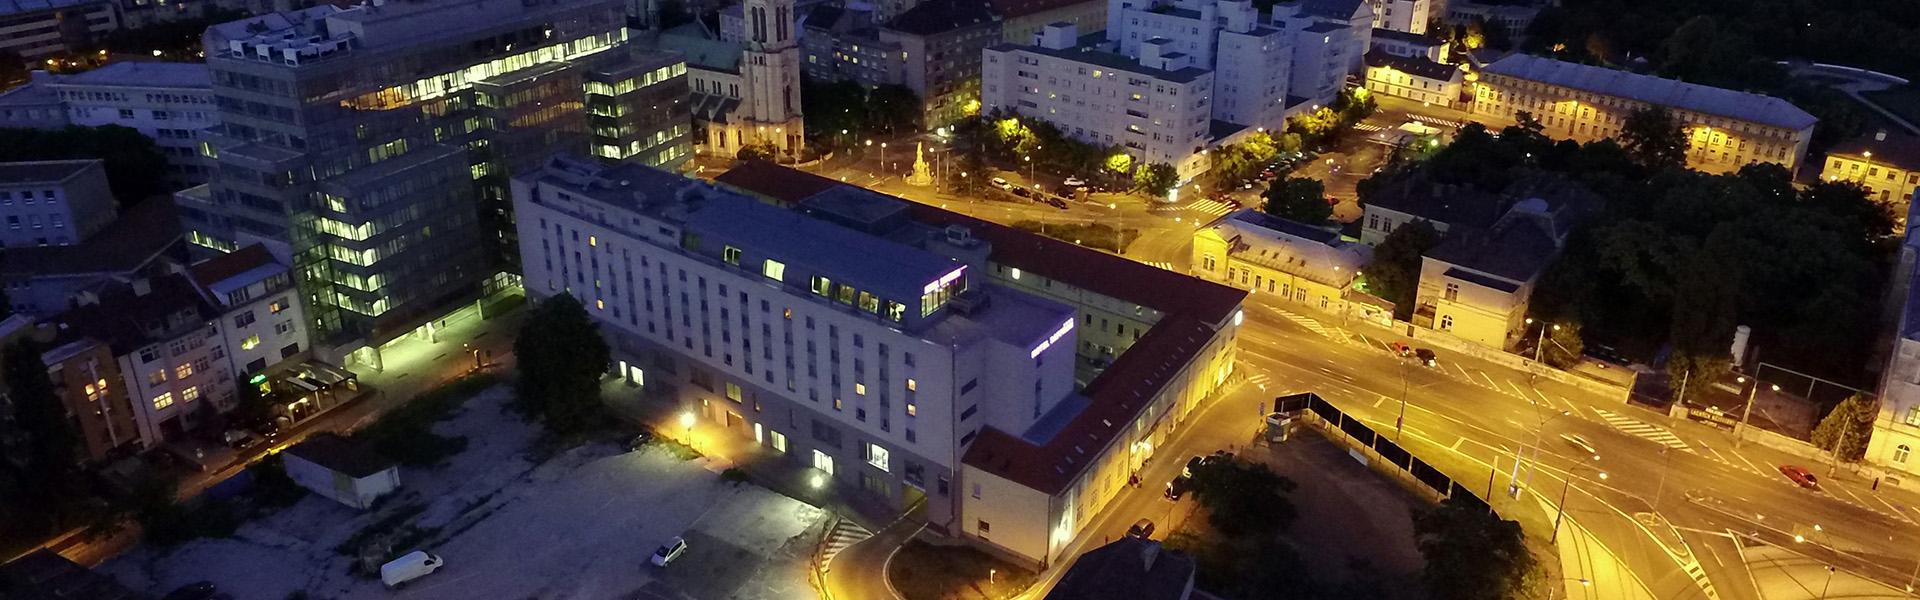 Bratislava-Staré Mesto, Radlinského 27